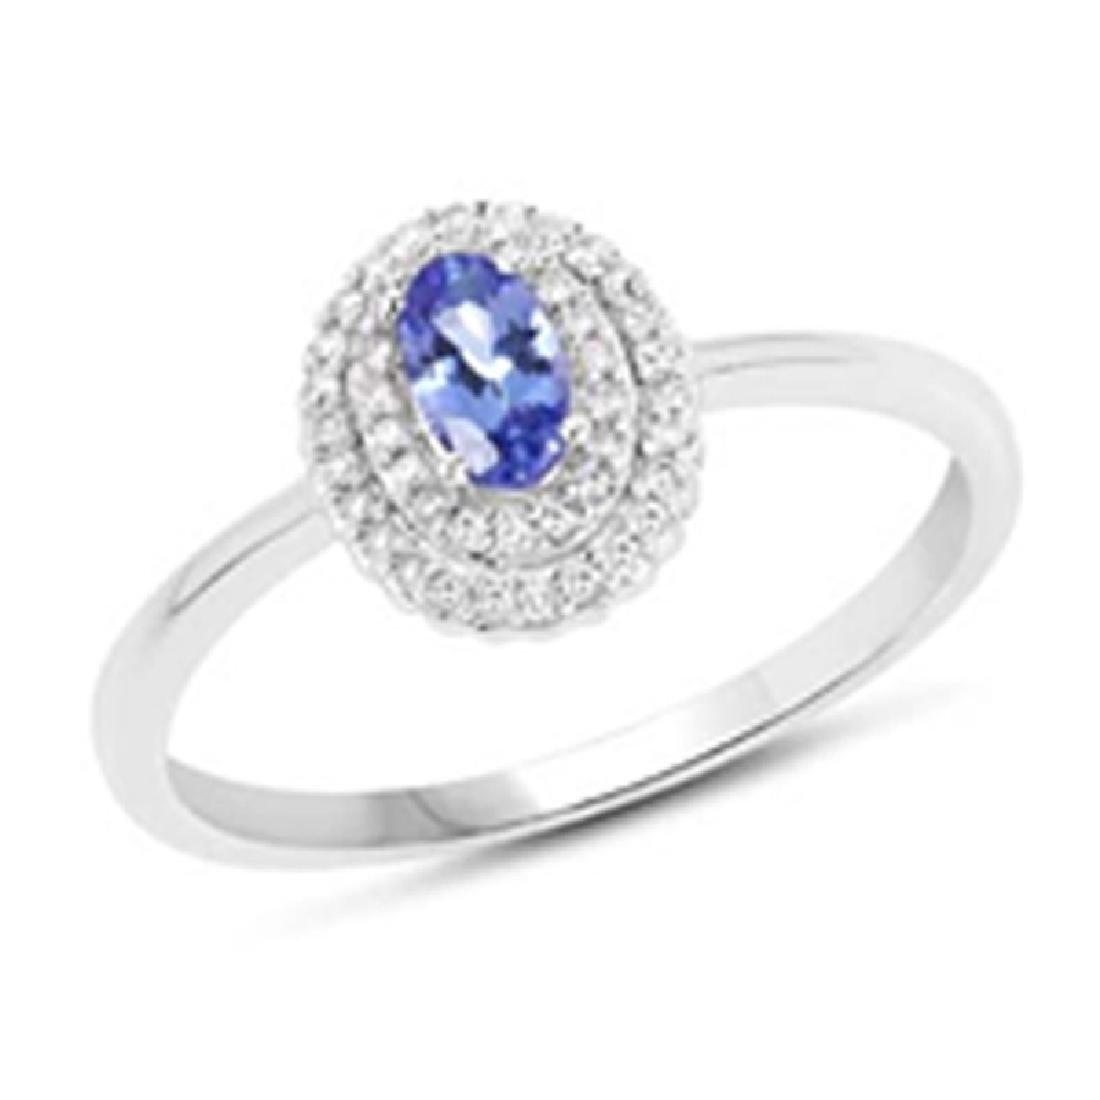 *Fine Jewelry 14KT White Gold, 2.08CT Tanzanite Oval